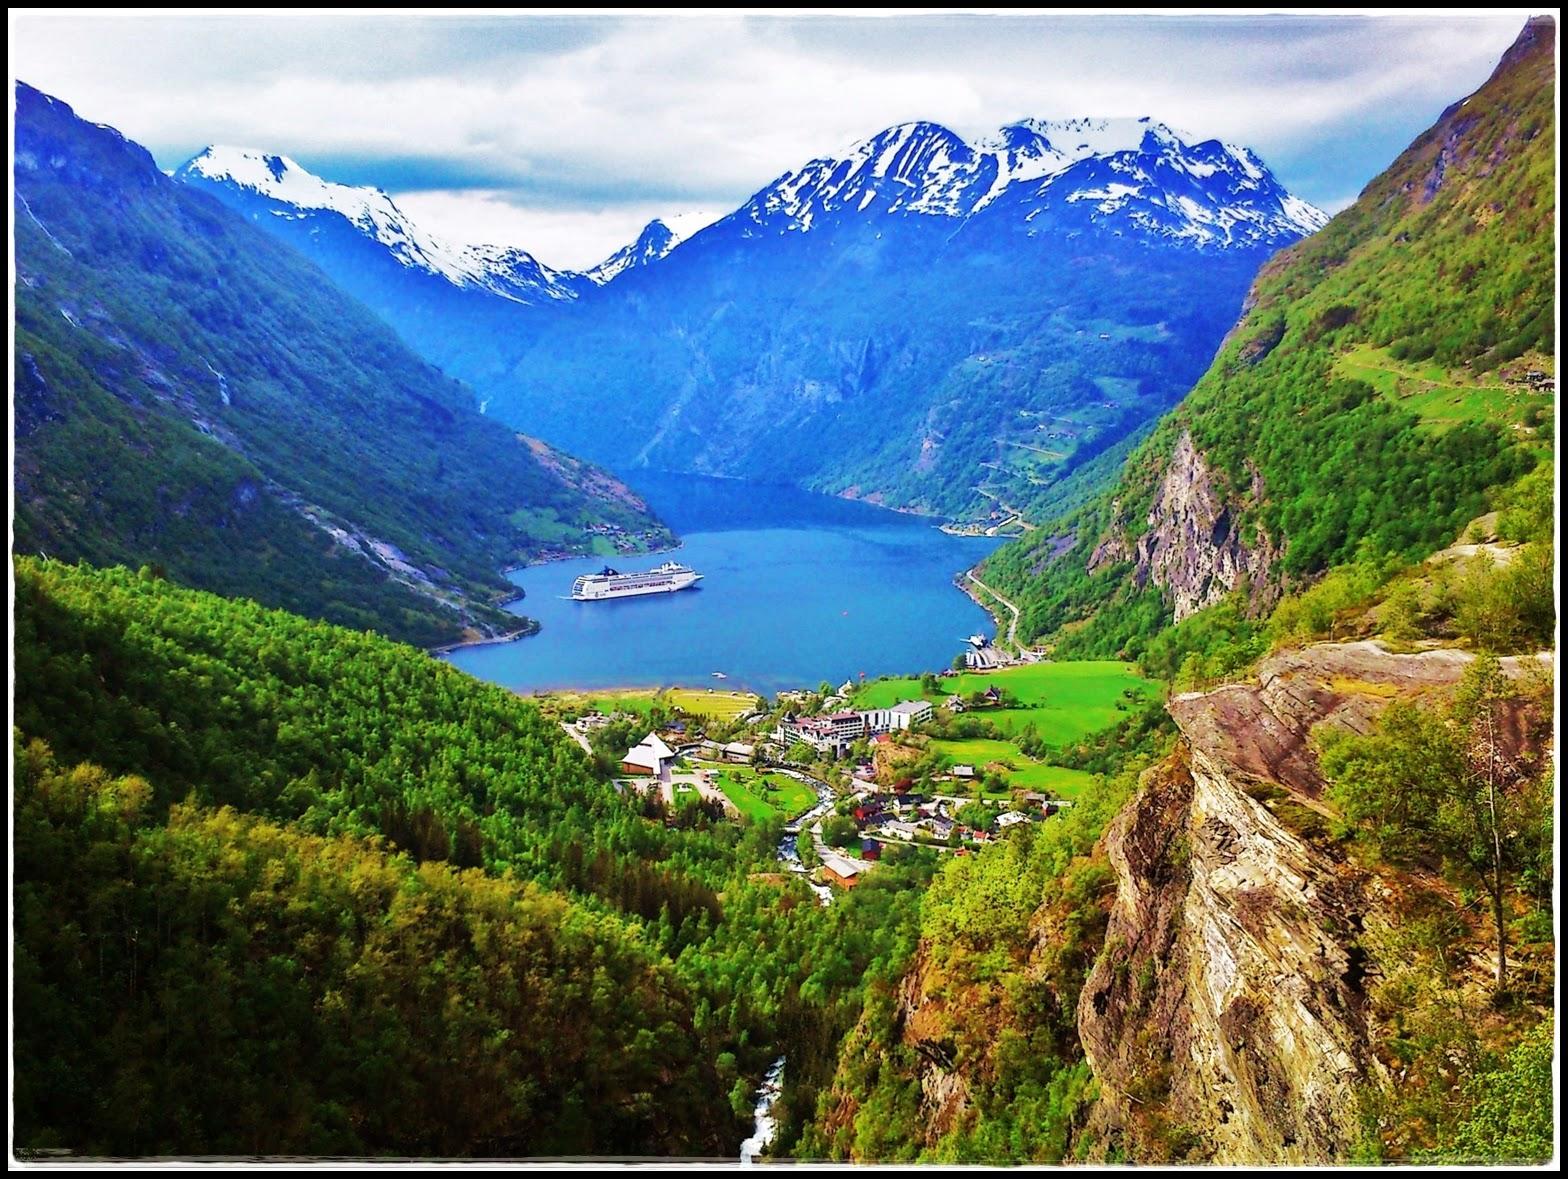 2014 - Geirangerfjord